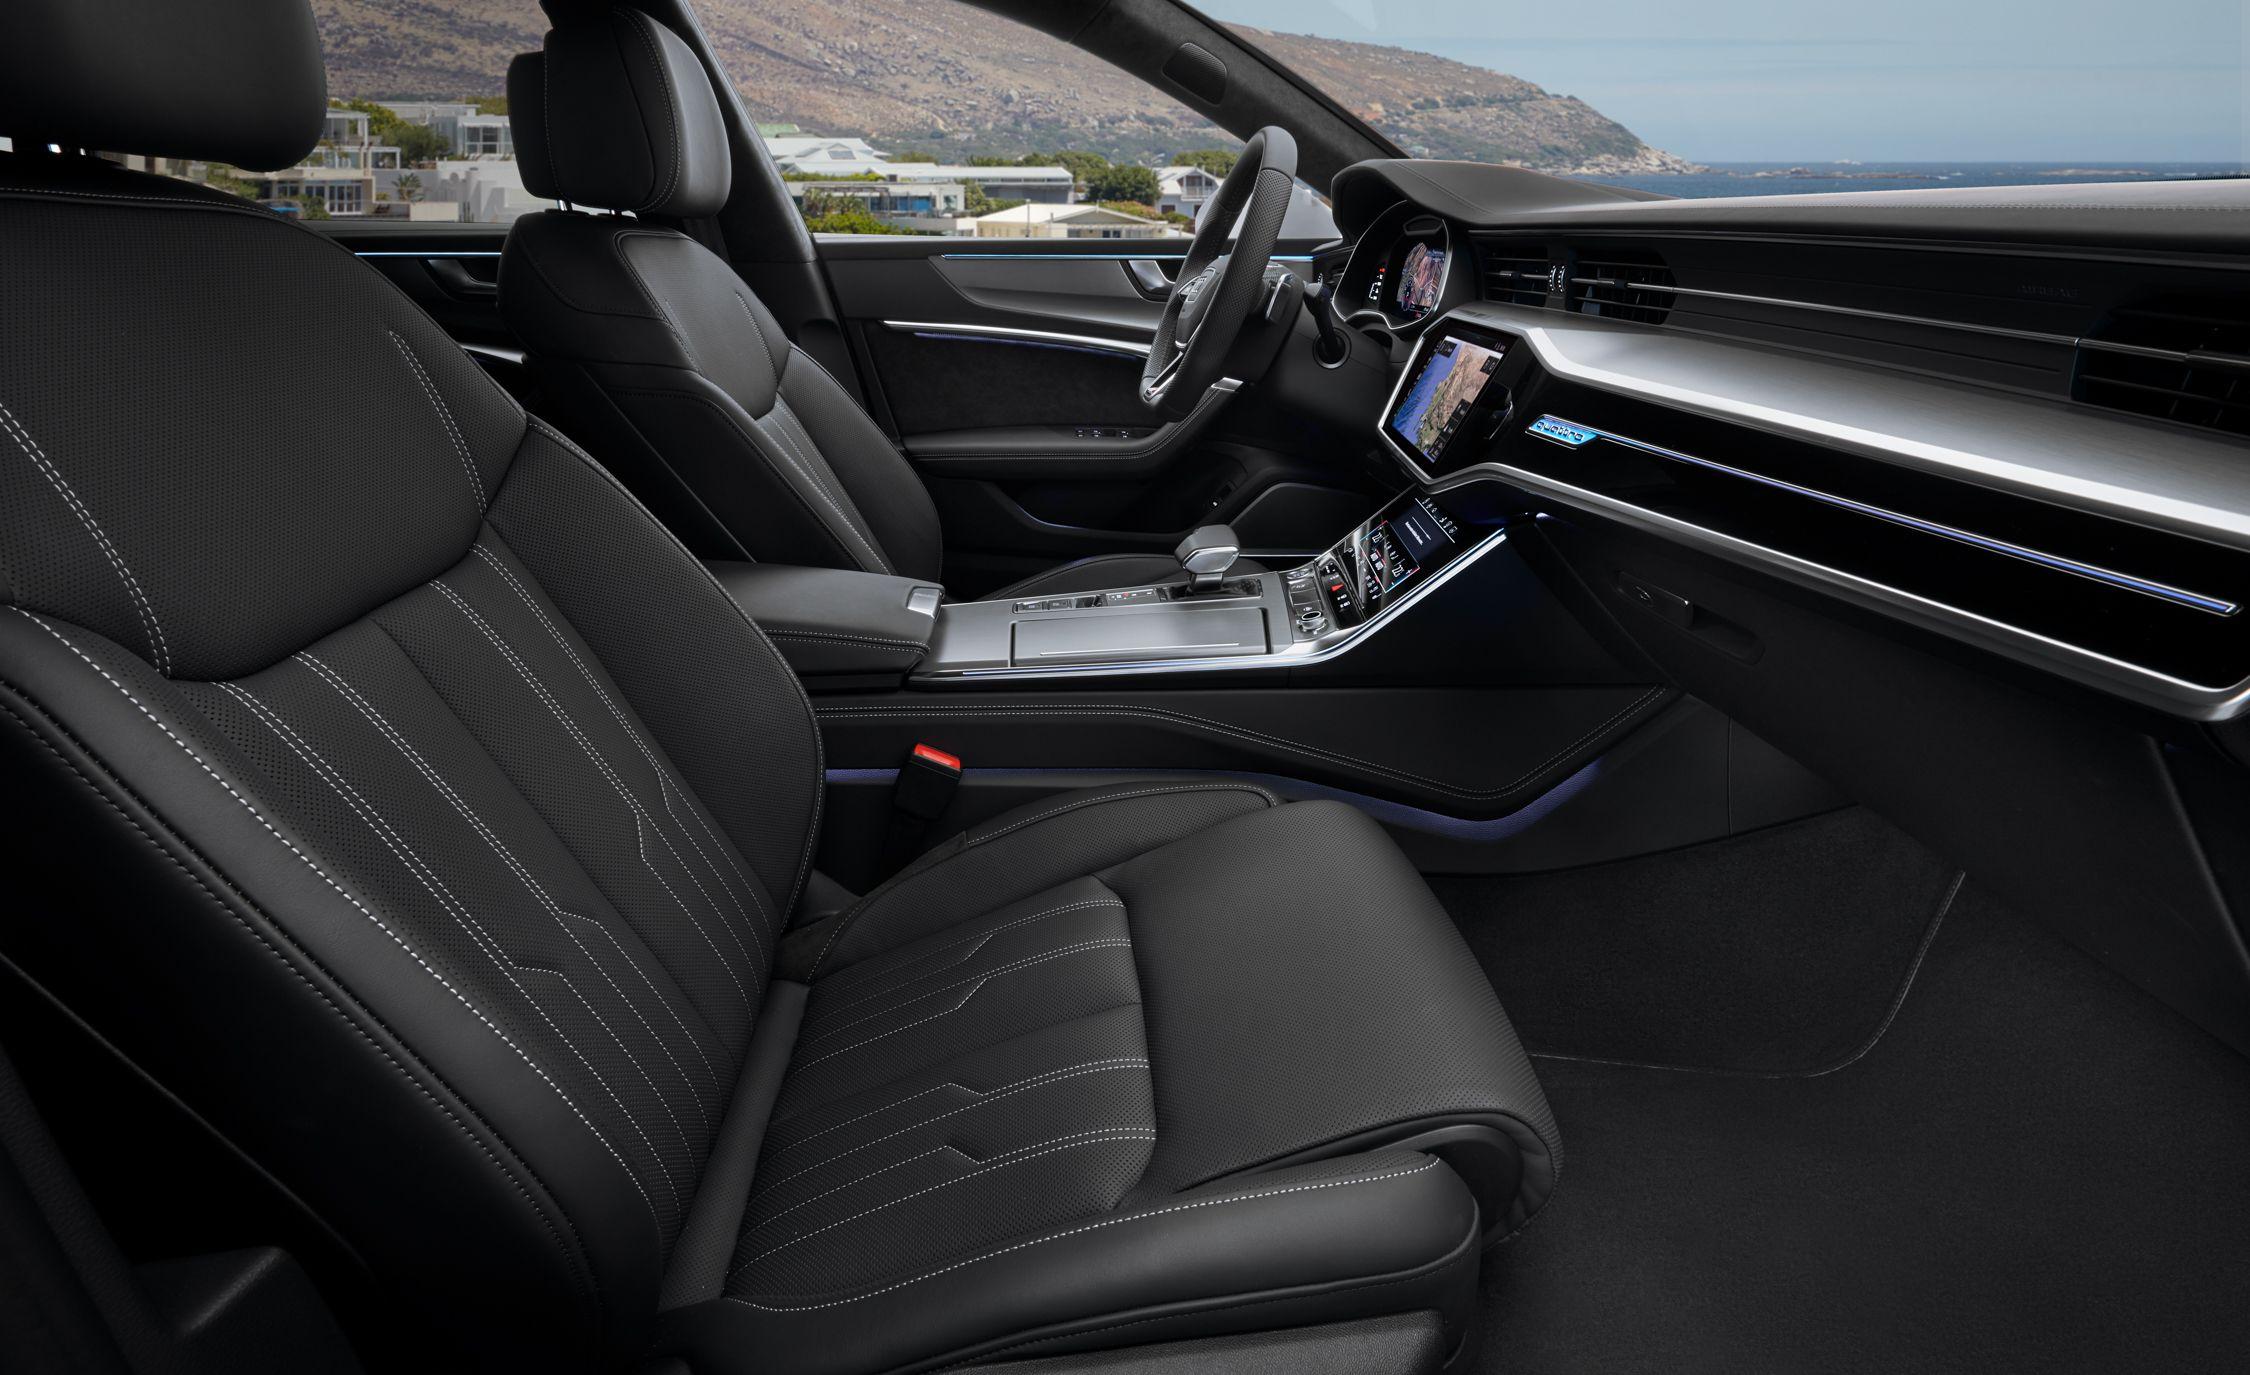 2019-Audi-A7-Sportback-192-1.jpg